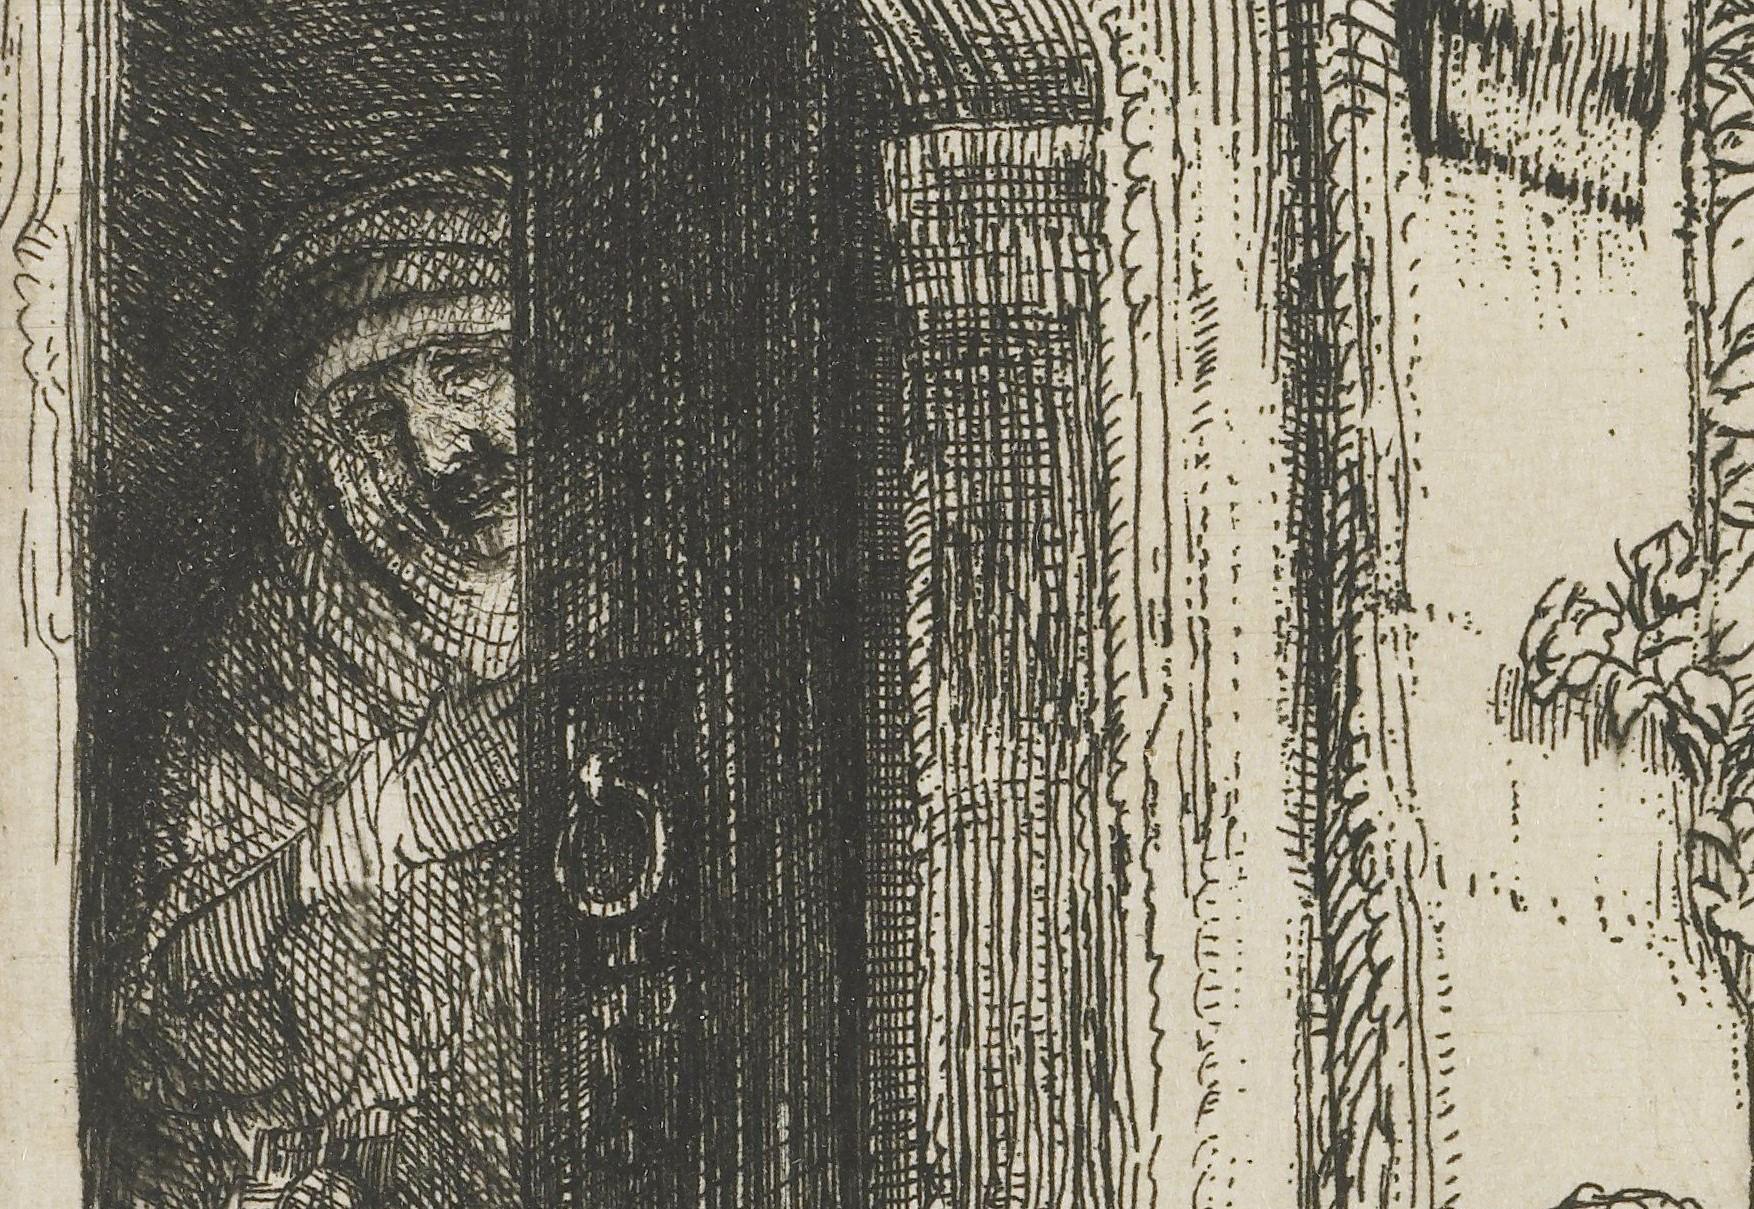 """The Book of Sarah"" vs. Rembrandt"